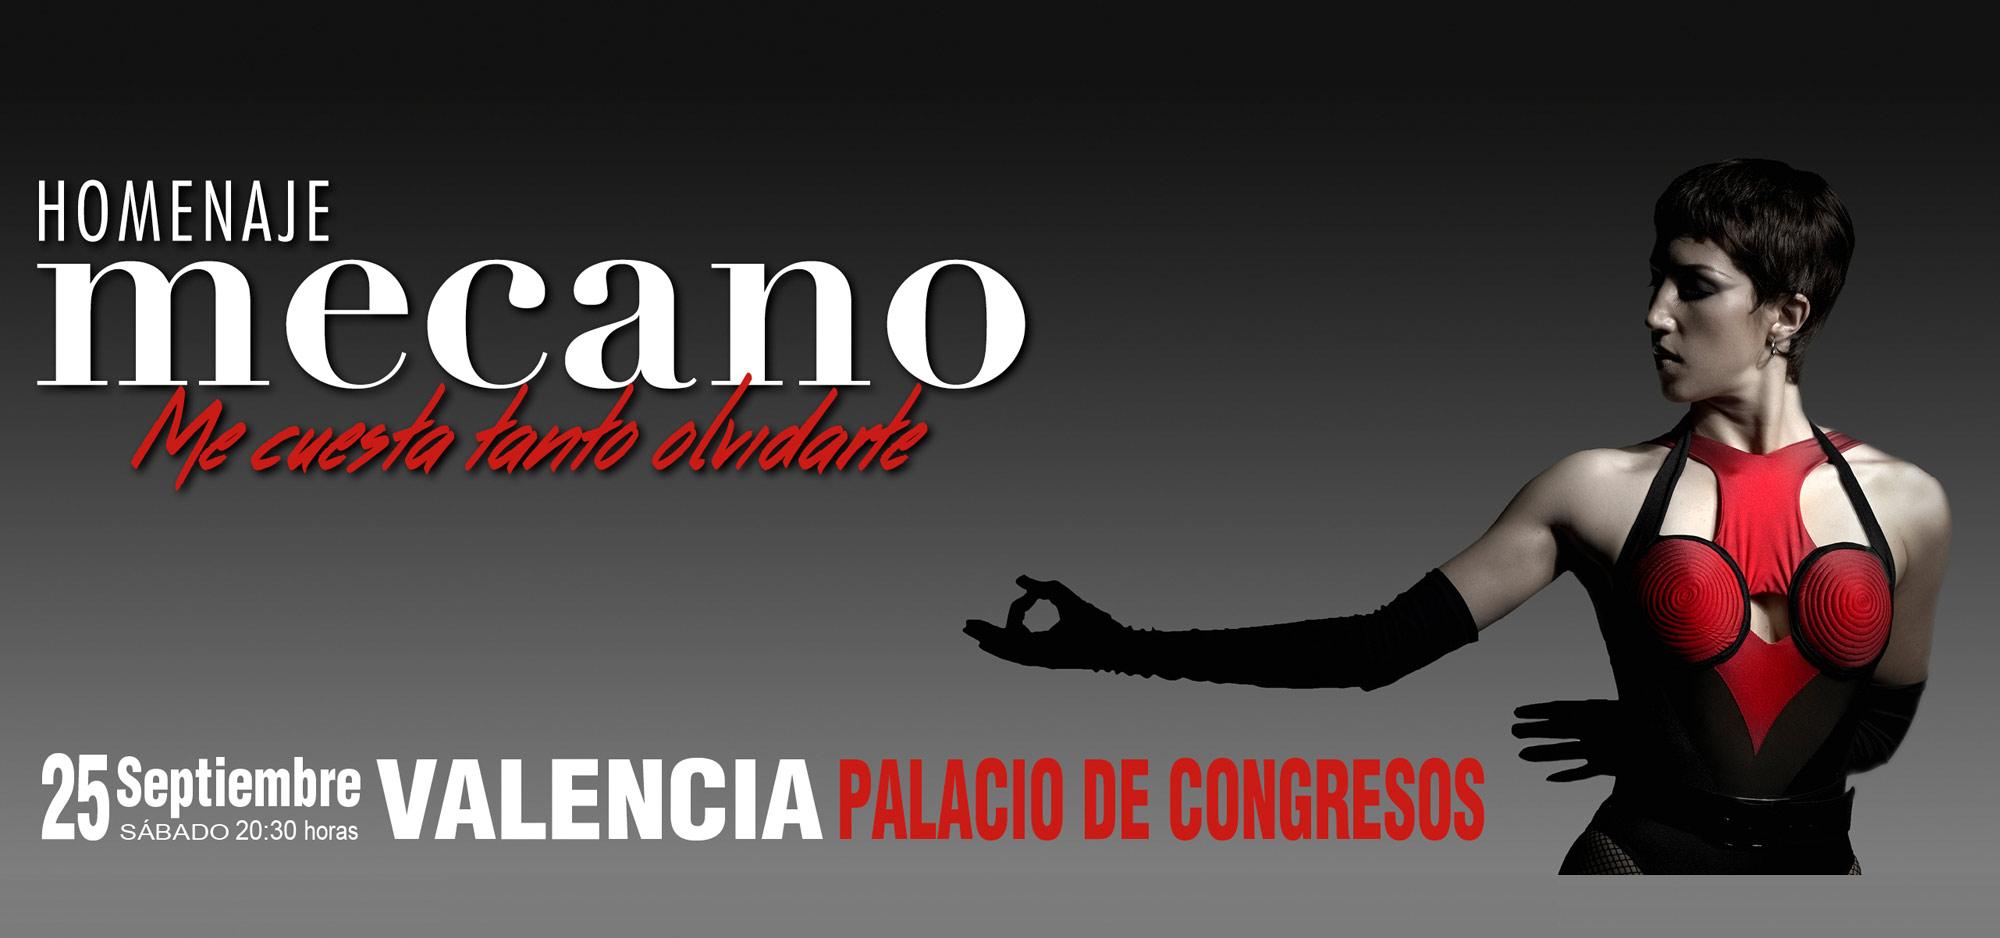 Homenaje Mercano Málaga Apoentradas